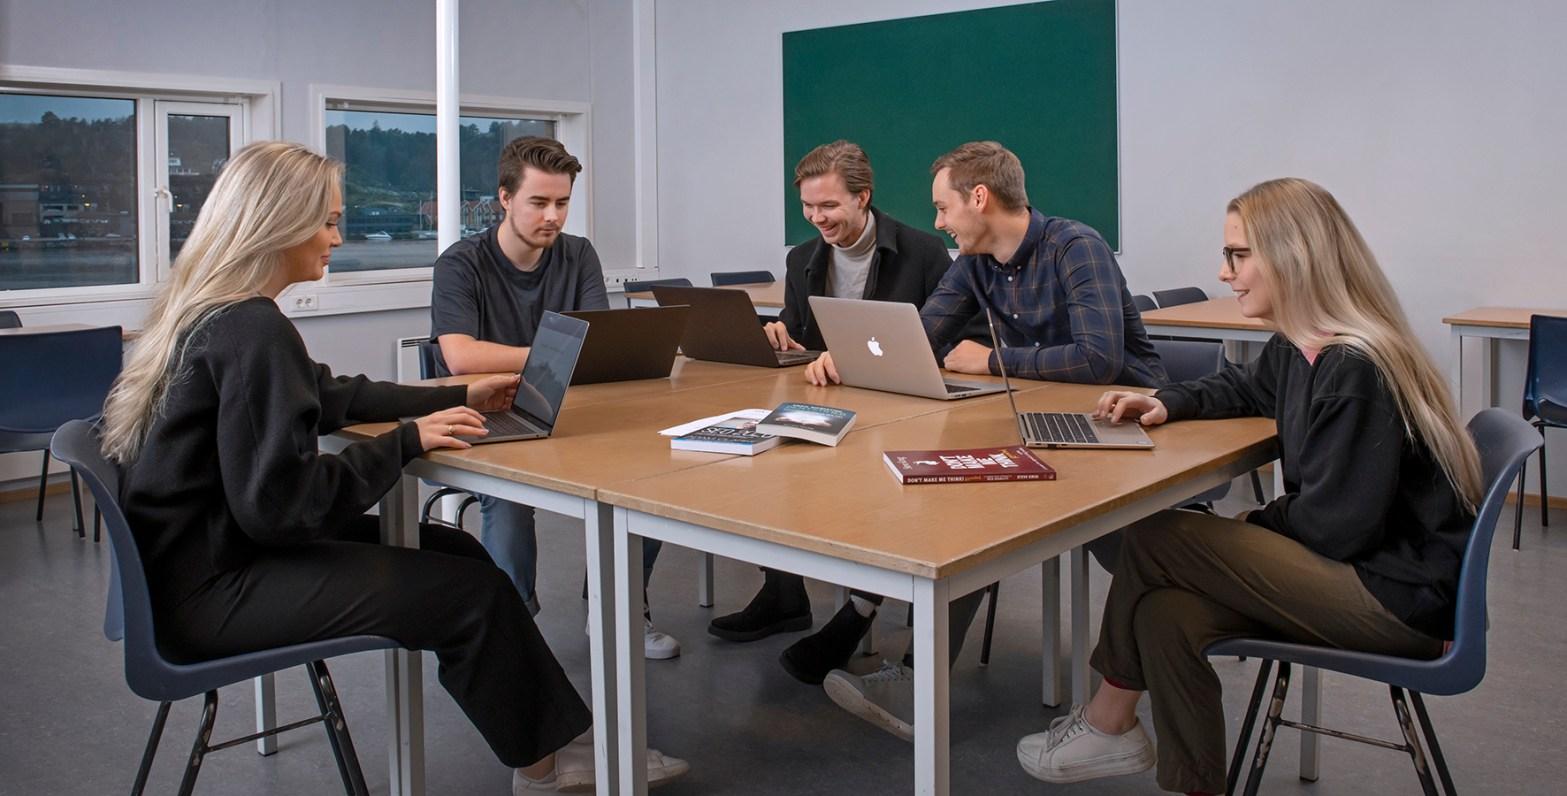 Gokstad Akademiet studenter som arbeider